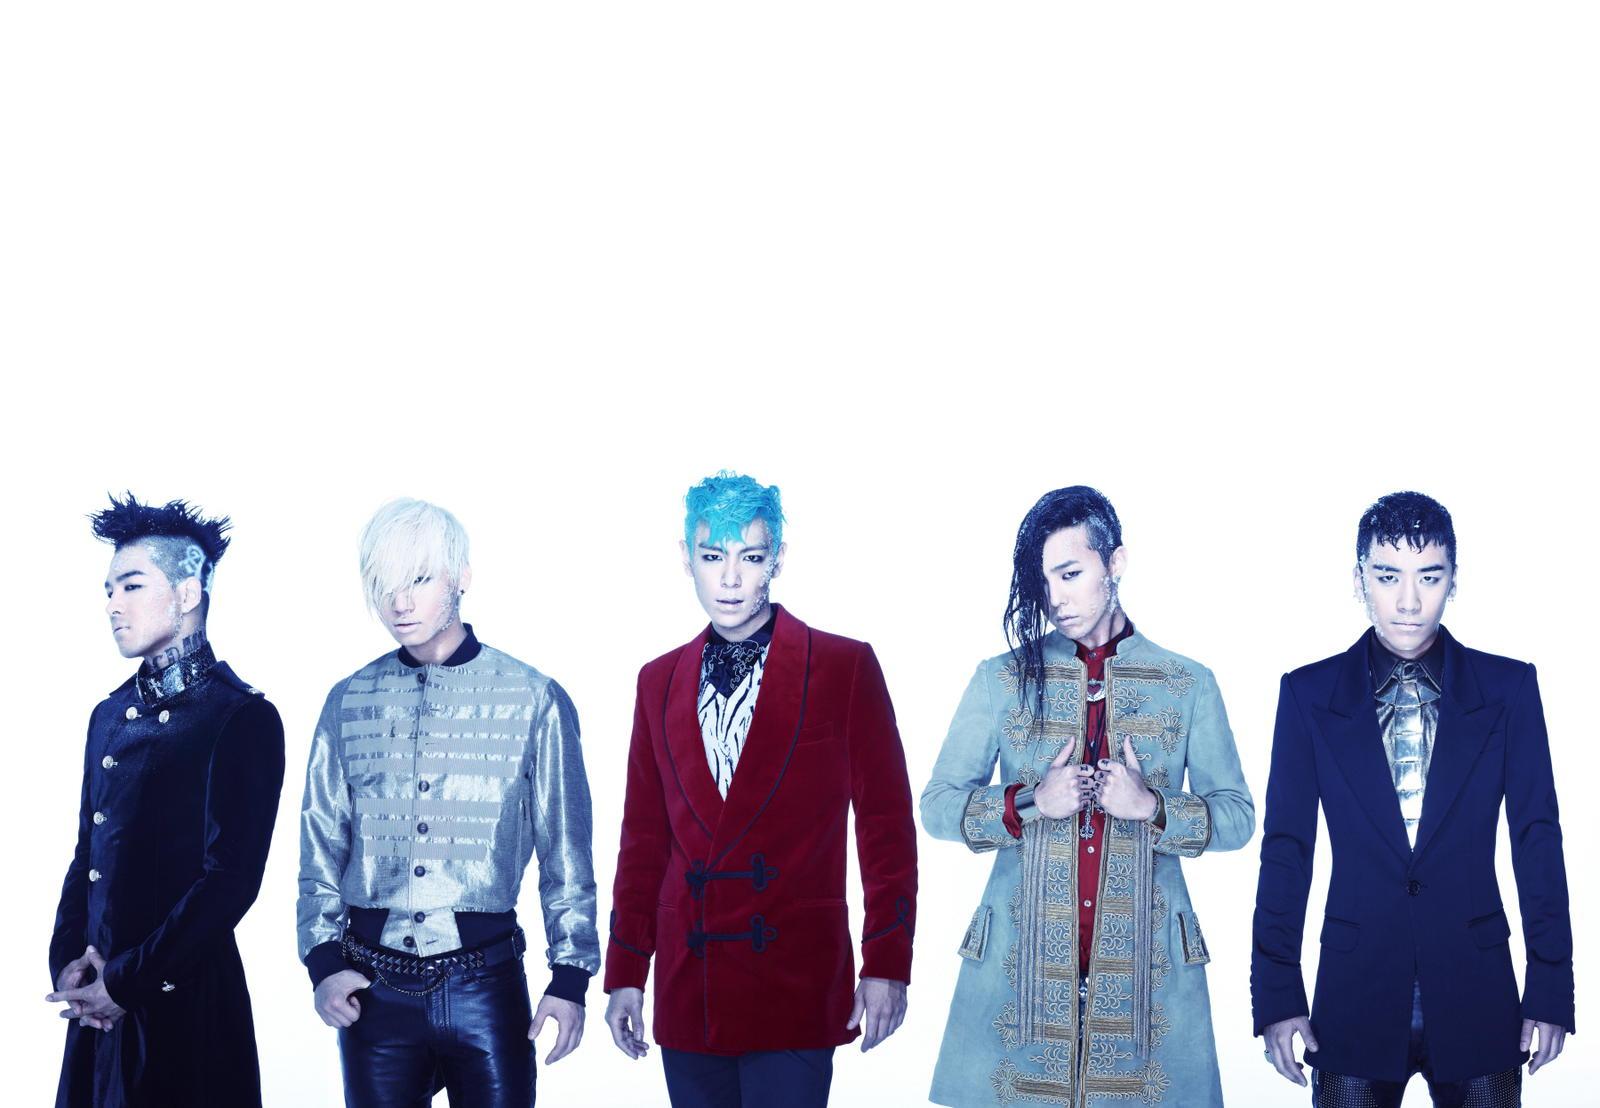 Come Back Album Alive Korean Group KPOP HD WallpapersK POP Wallpapers 1600x1108